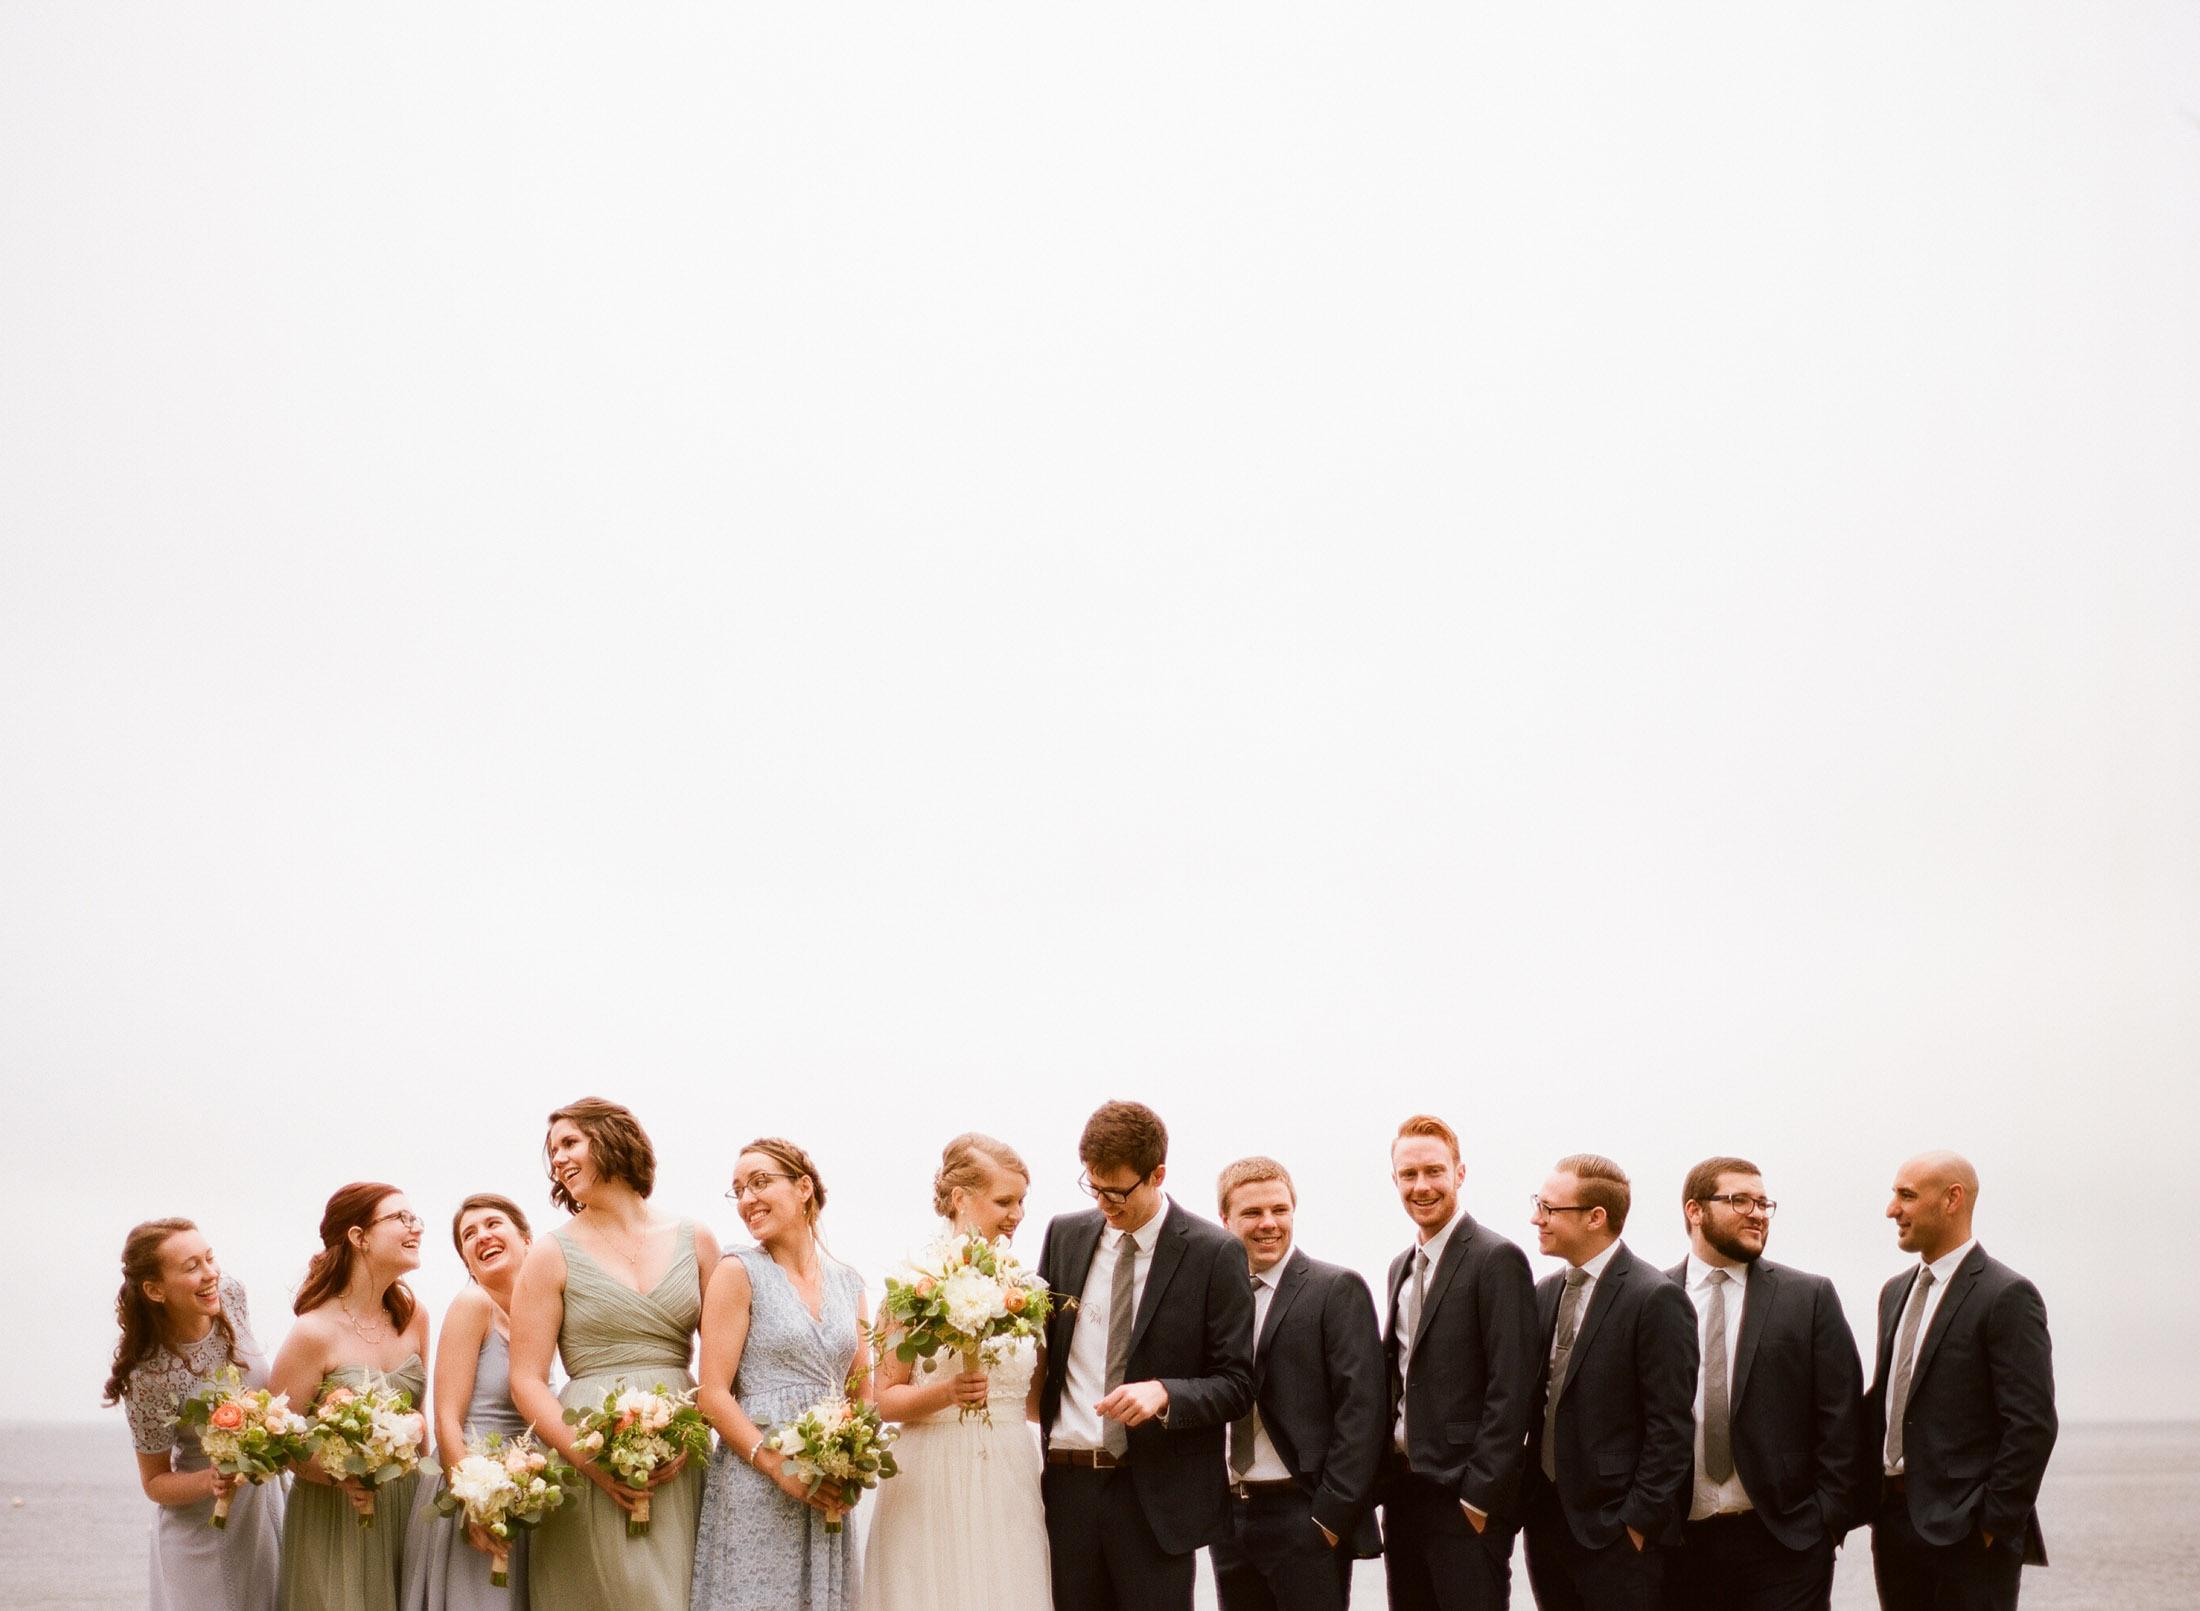 Elks-Wedding-Gloucester-38.jpg